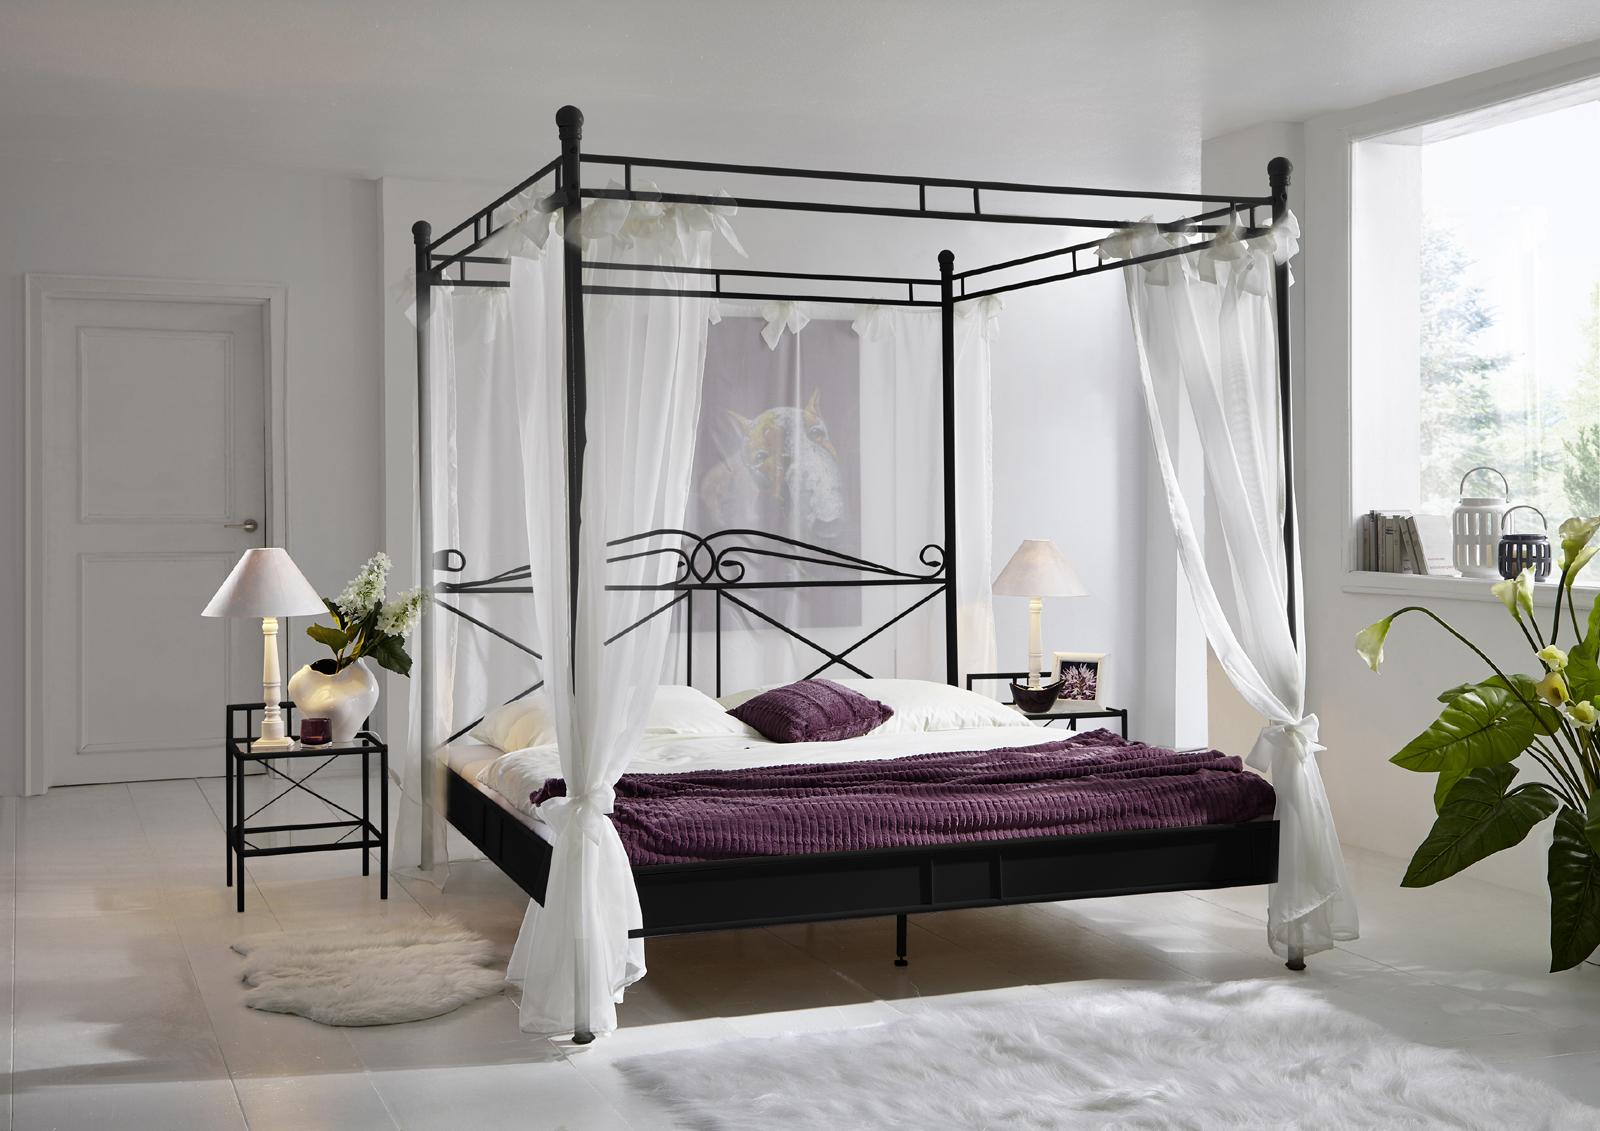 Quadrato Möbel: Suchergebnis auf amazon für: quadrato möbel ...